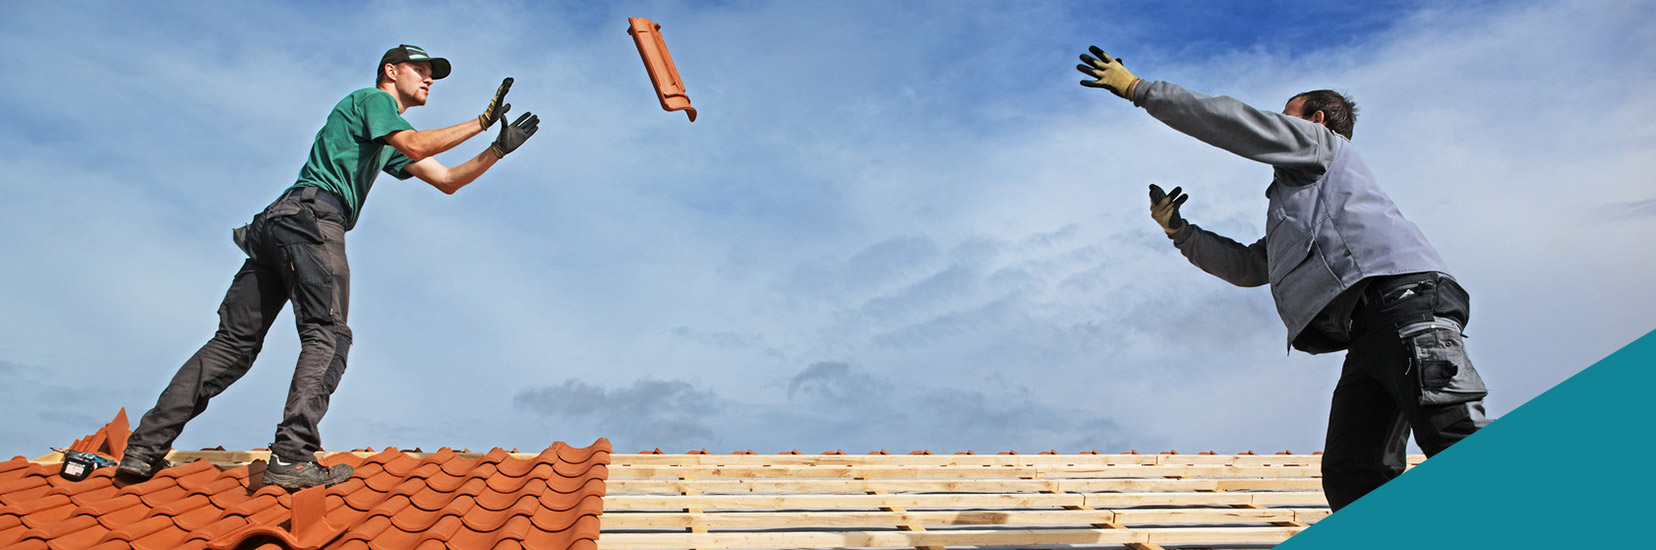 NORDIC DACH - Dacheindeckung vom Profi